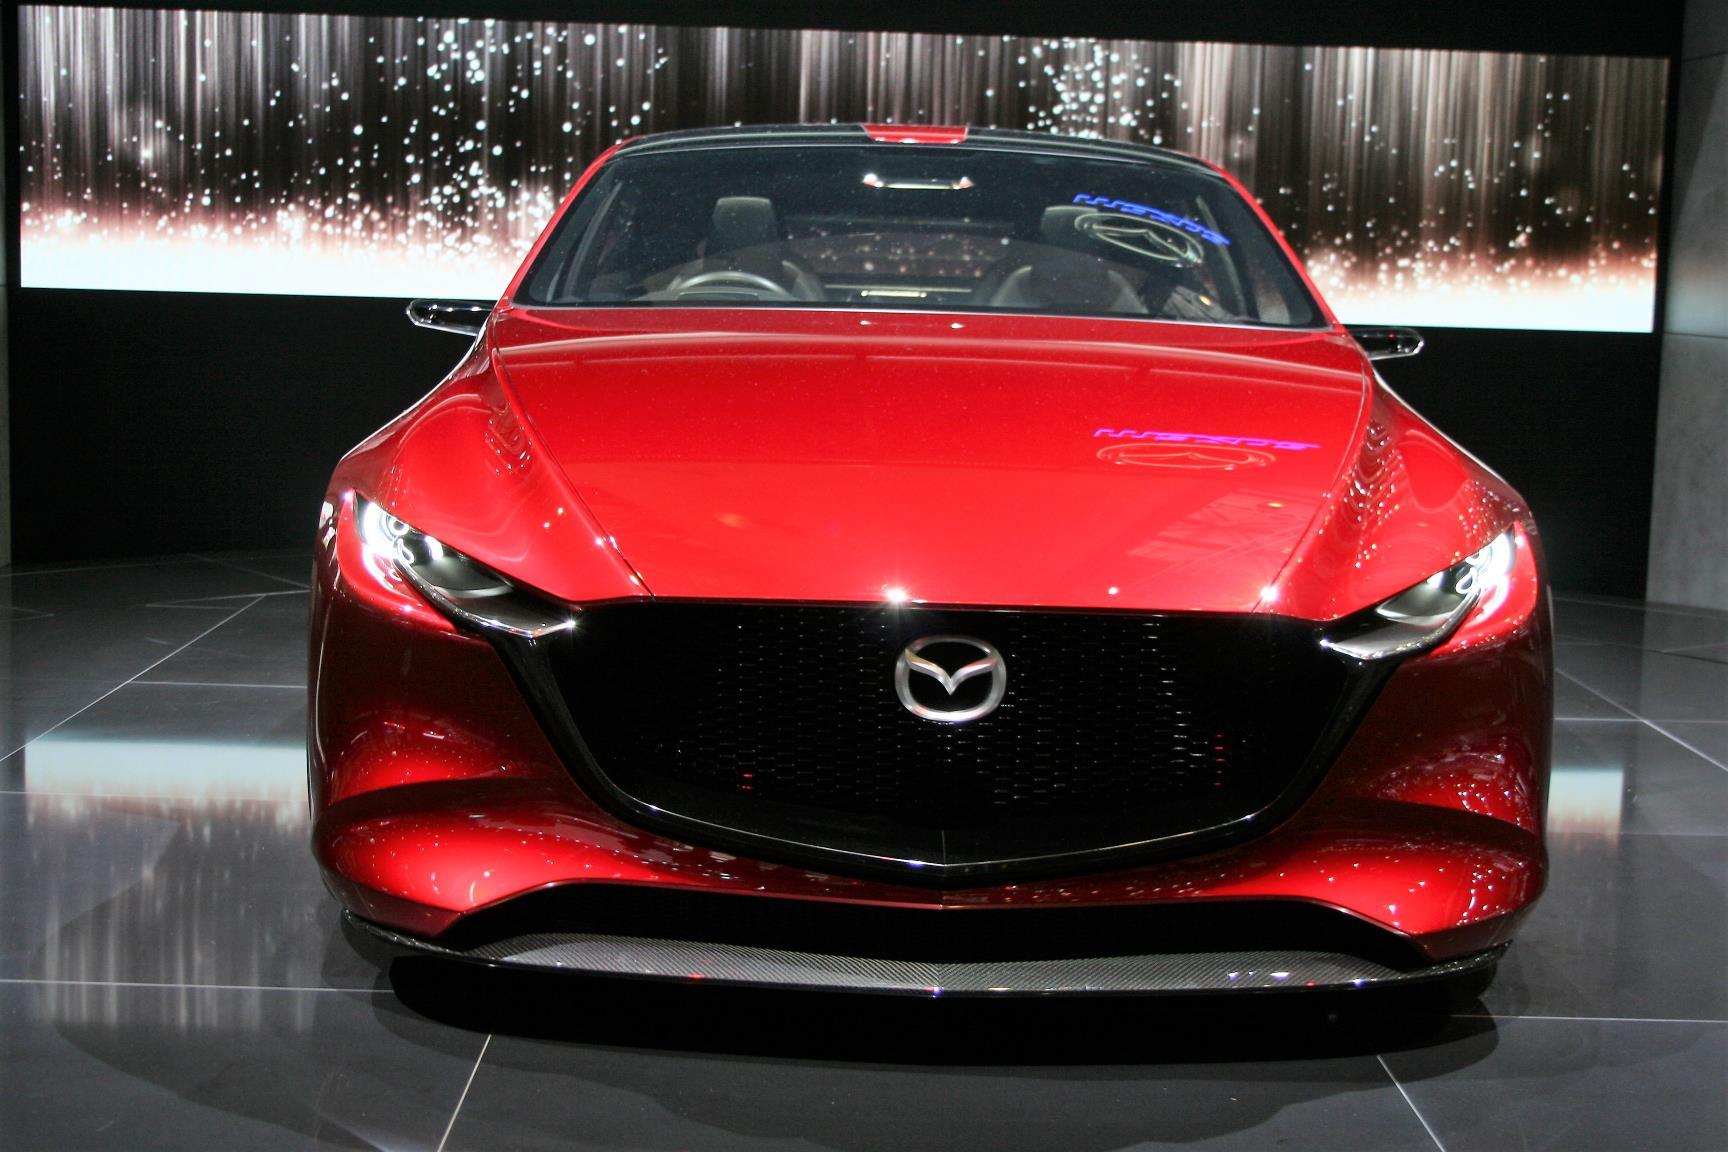 Geneva Motor Show 2018 Mega Gallery Part 1 (125)